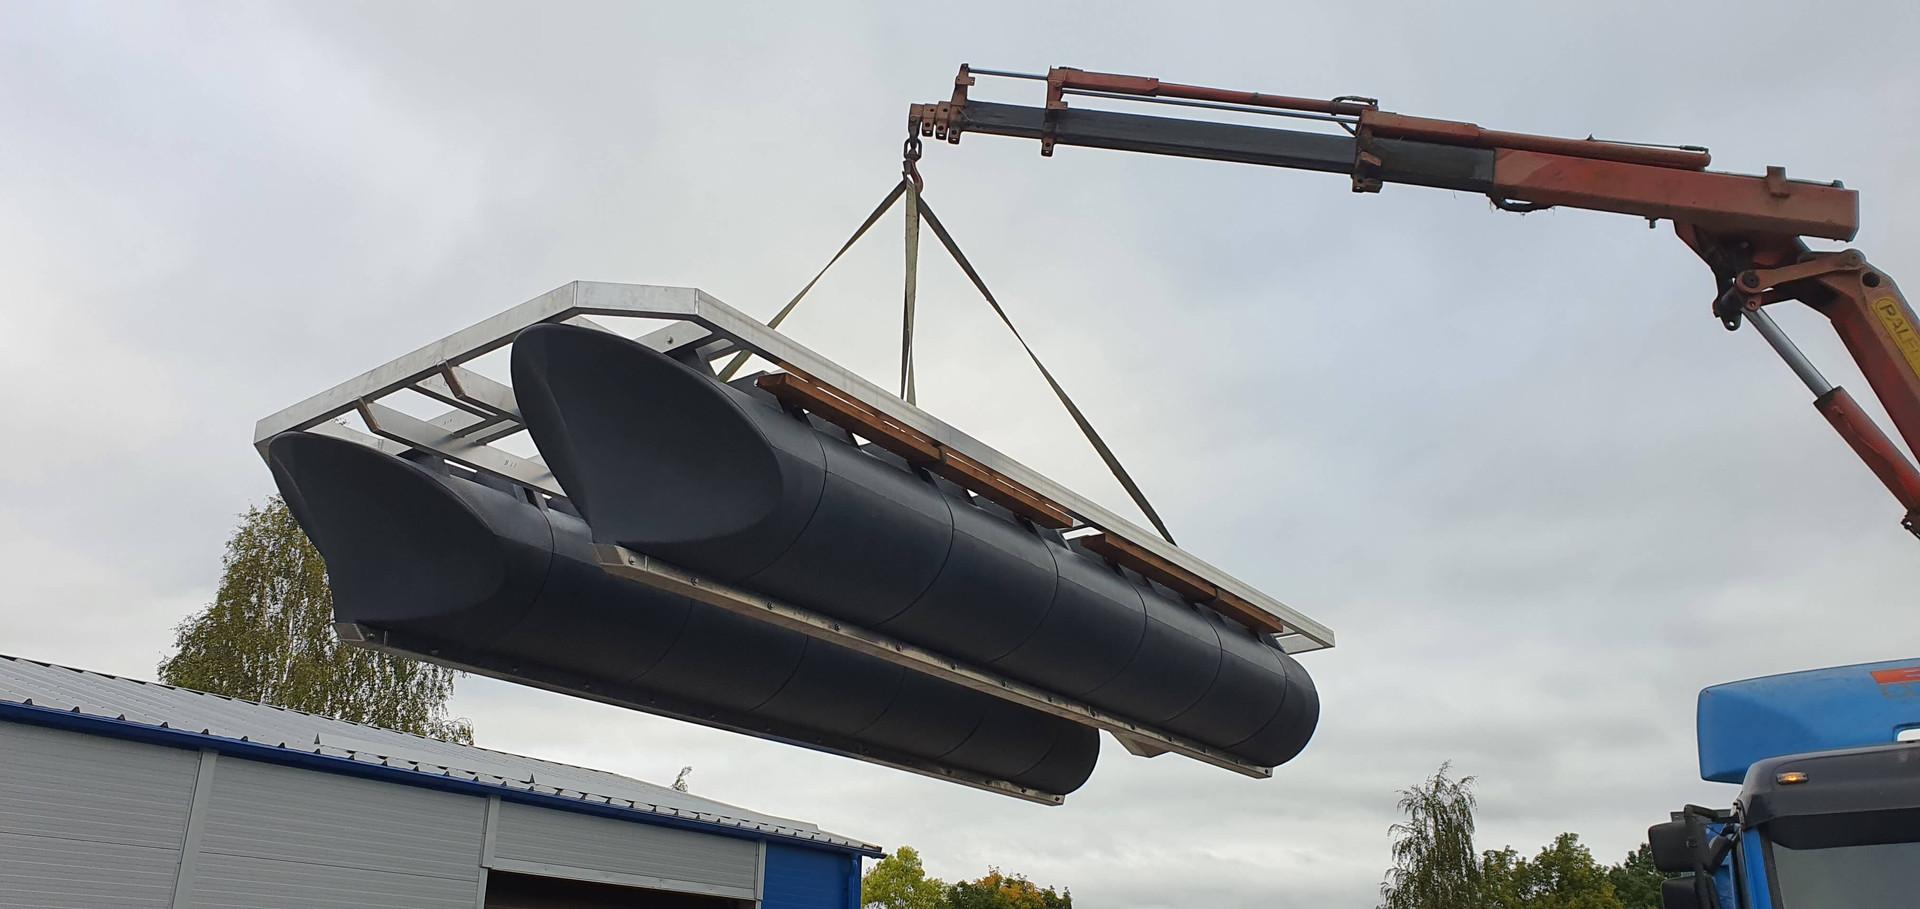 Lifting of 5,8m x 2,45m catamaran